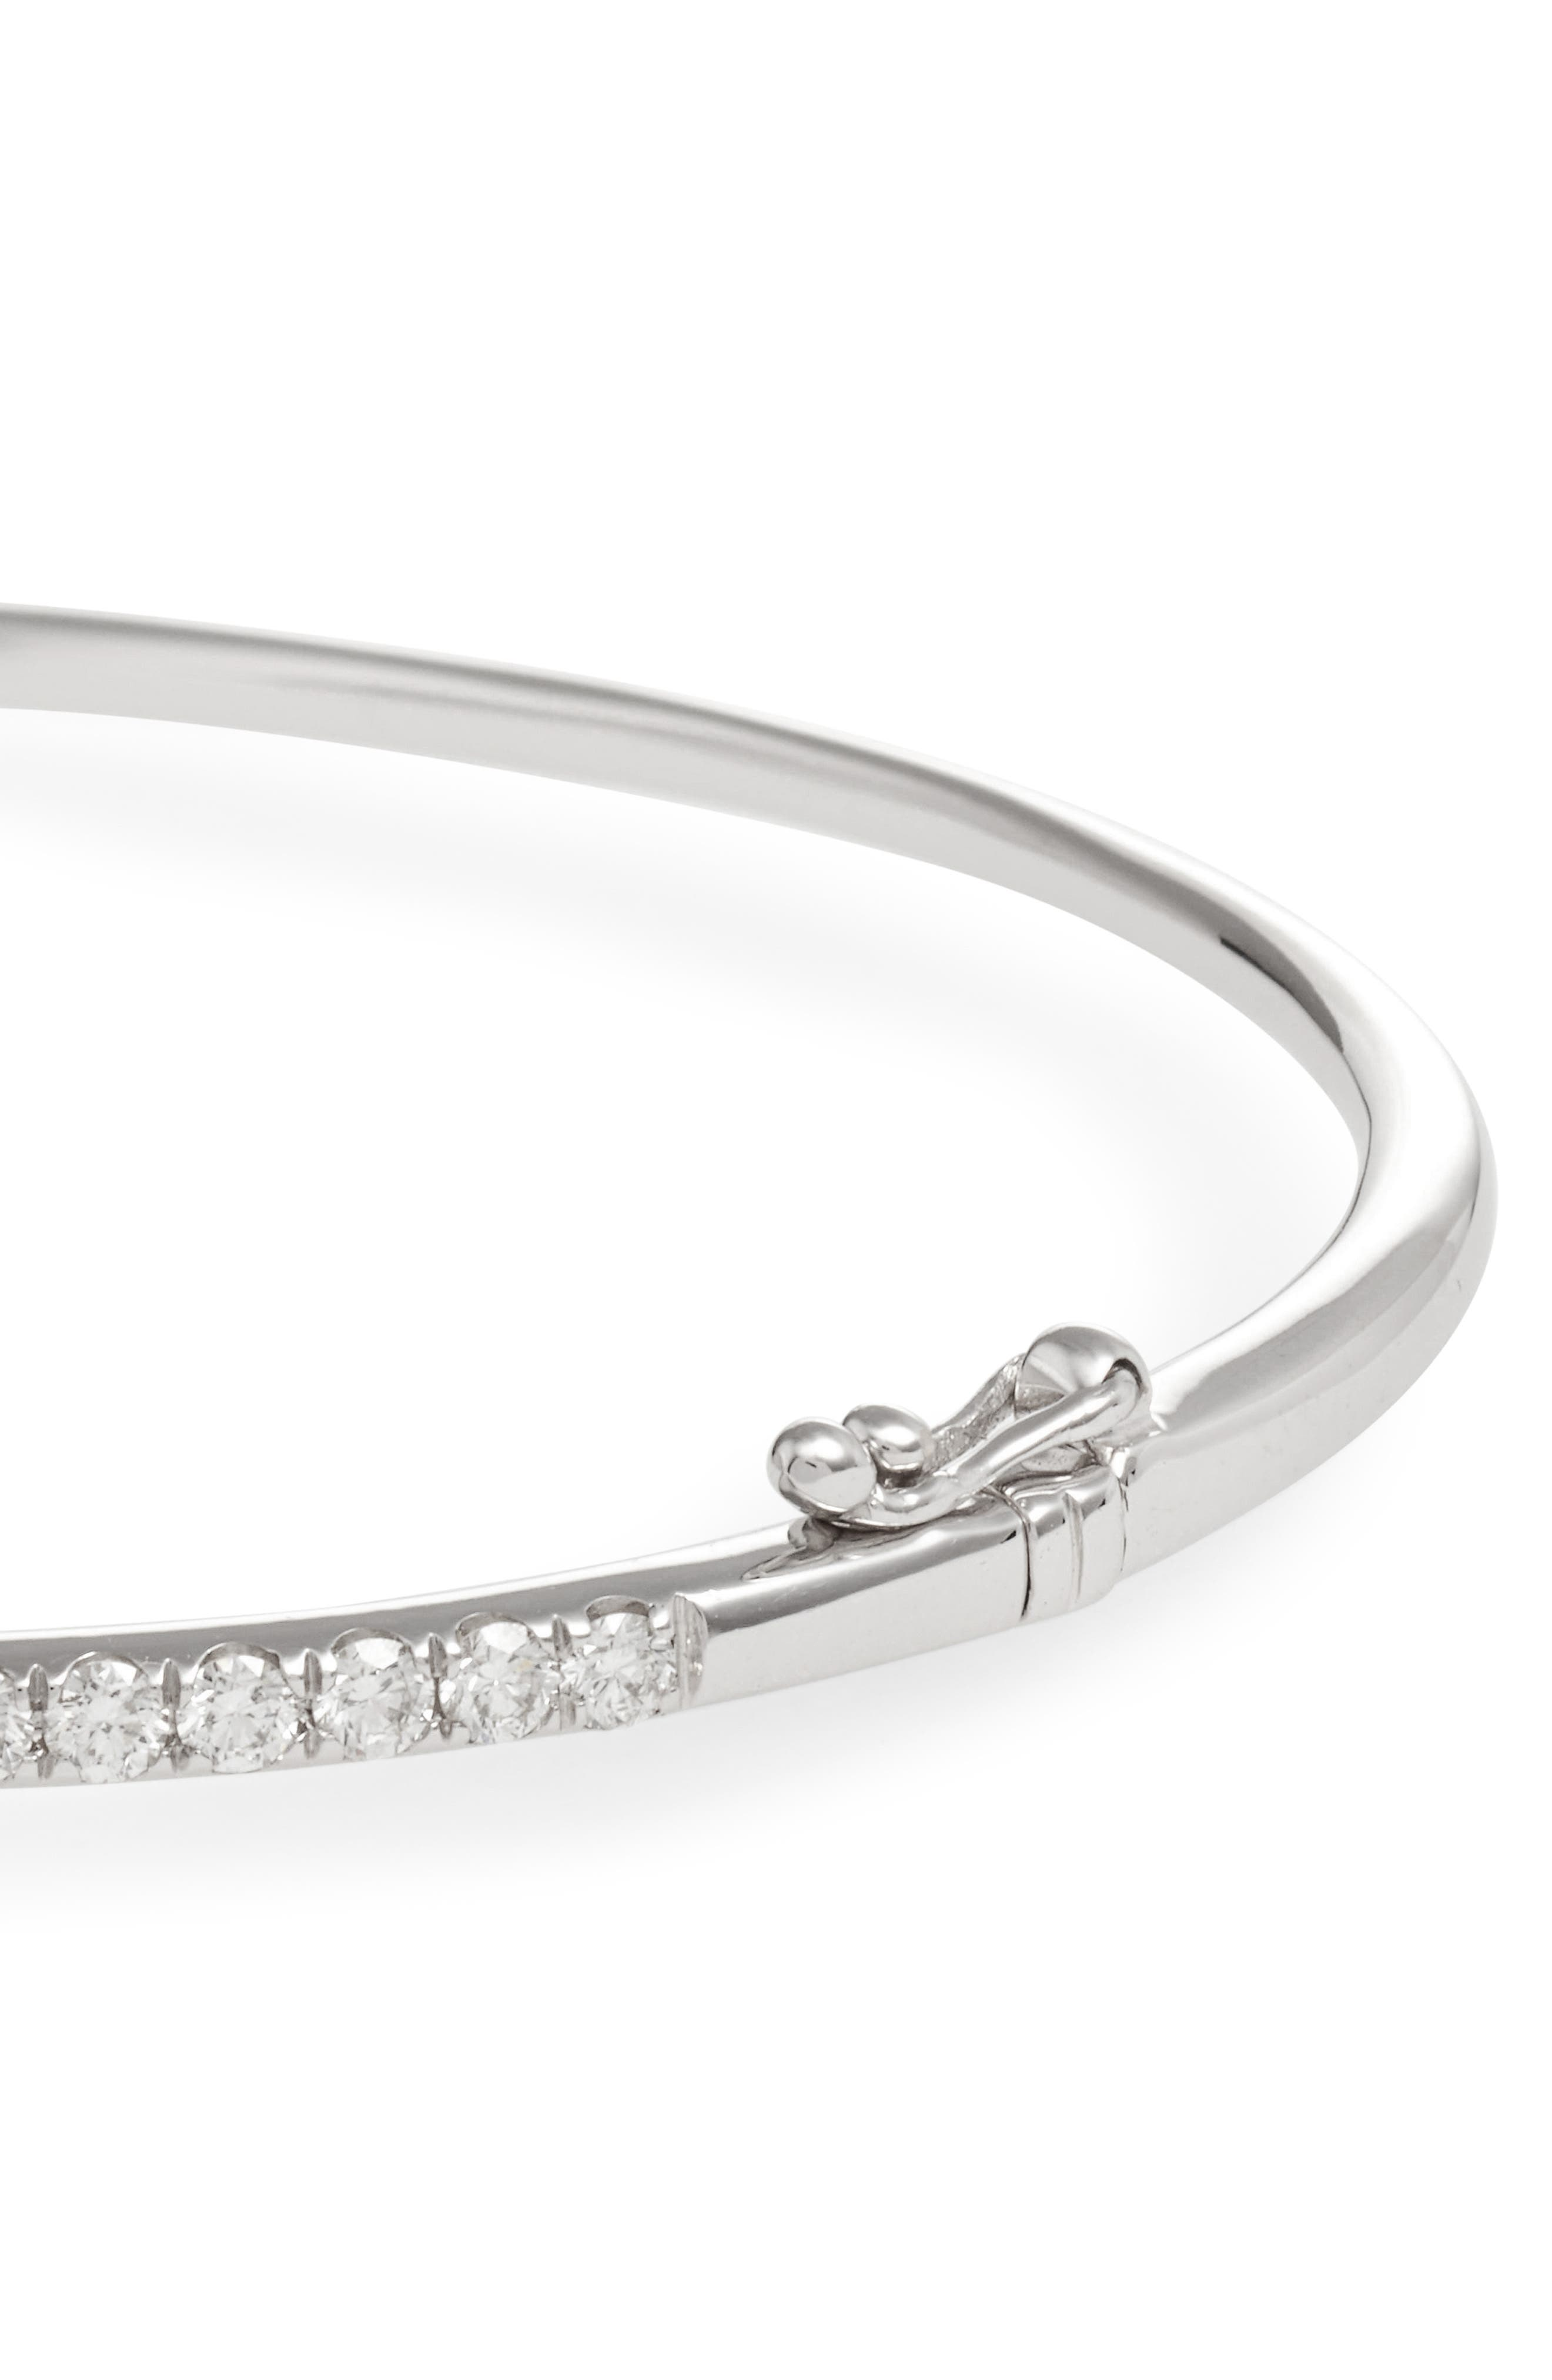 Stackable Large Skinny Diamond Bangle,                             Alternate thumbnail 4, color,                             WHITE GOLD